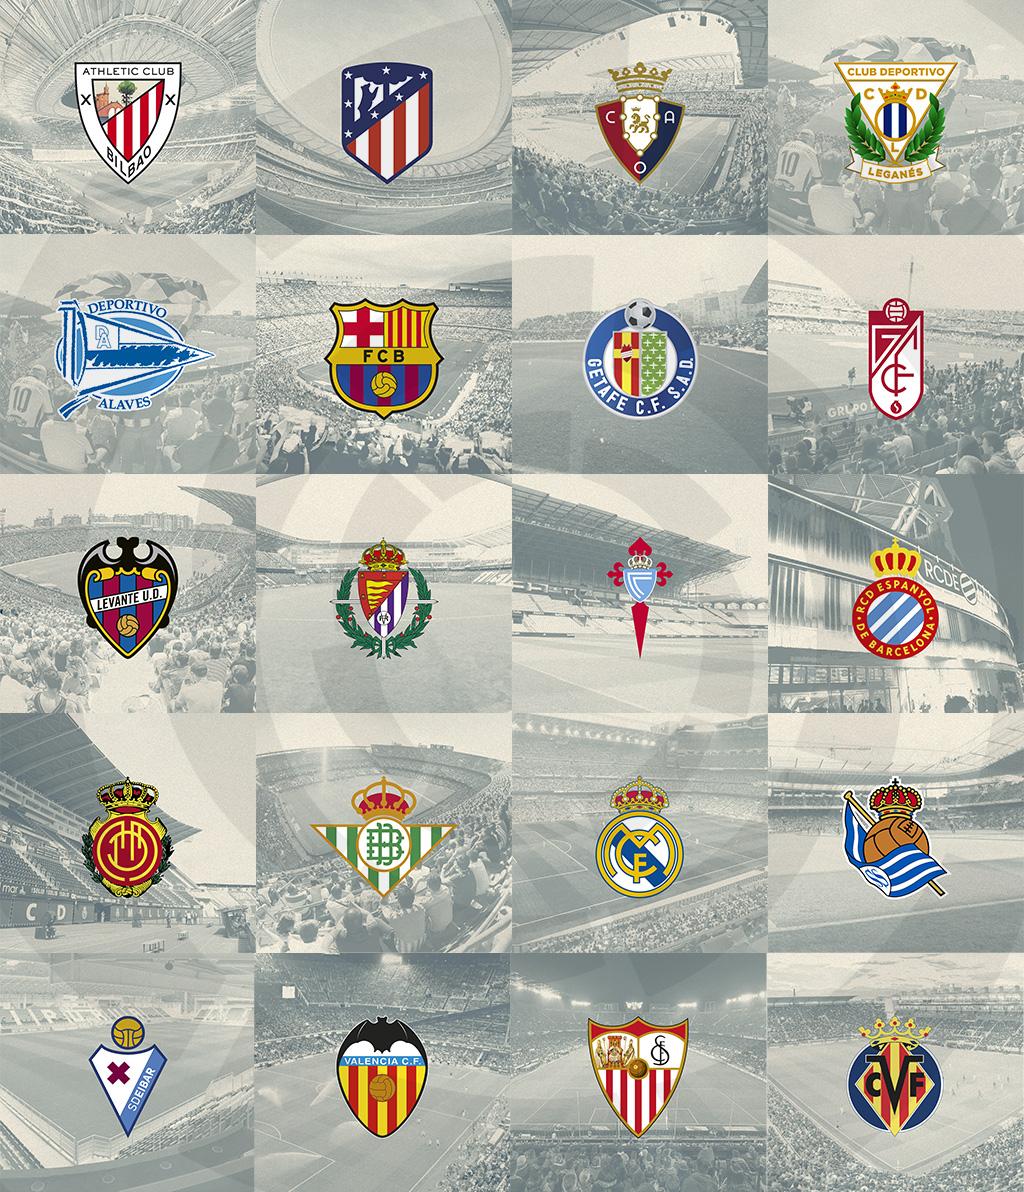 2019-20 LaLiga Santander Fixture List